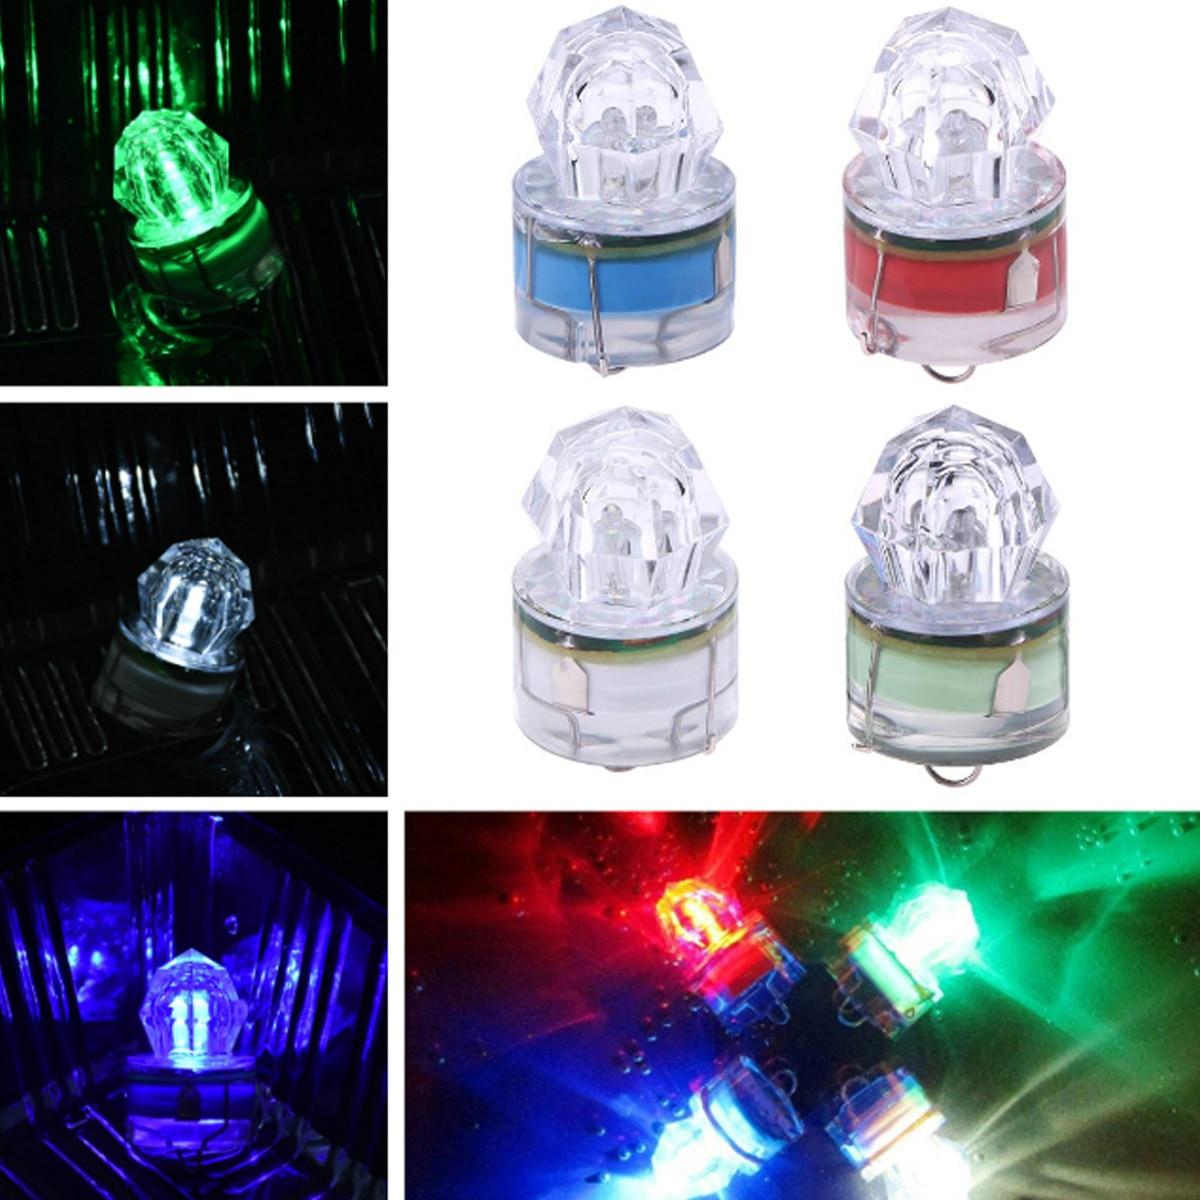 YORZENG Mini ABS LED Waterproof Fishing Bait Light Squid Fishing Lures Bait Deep Drop Diamond Underwater Fish Lure Lamp Lights